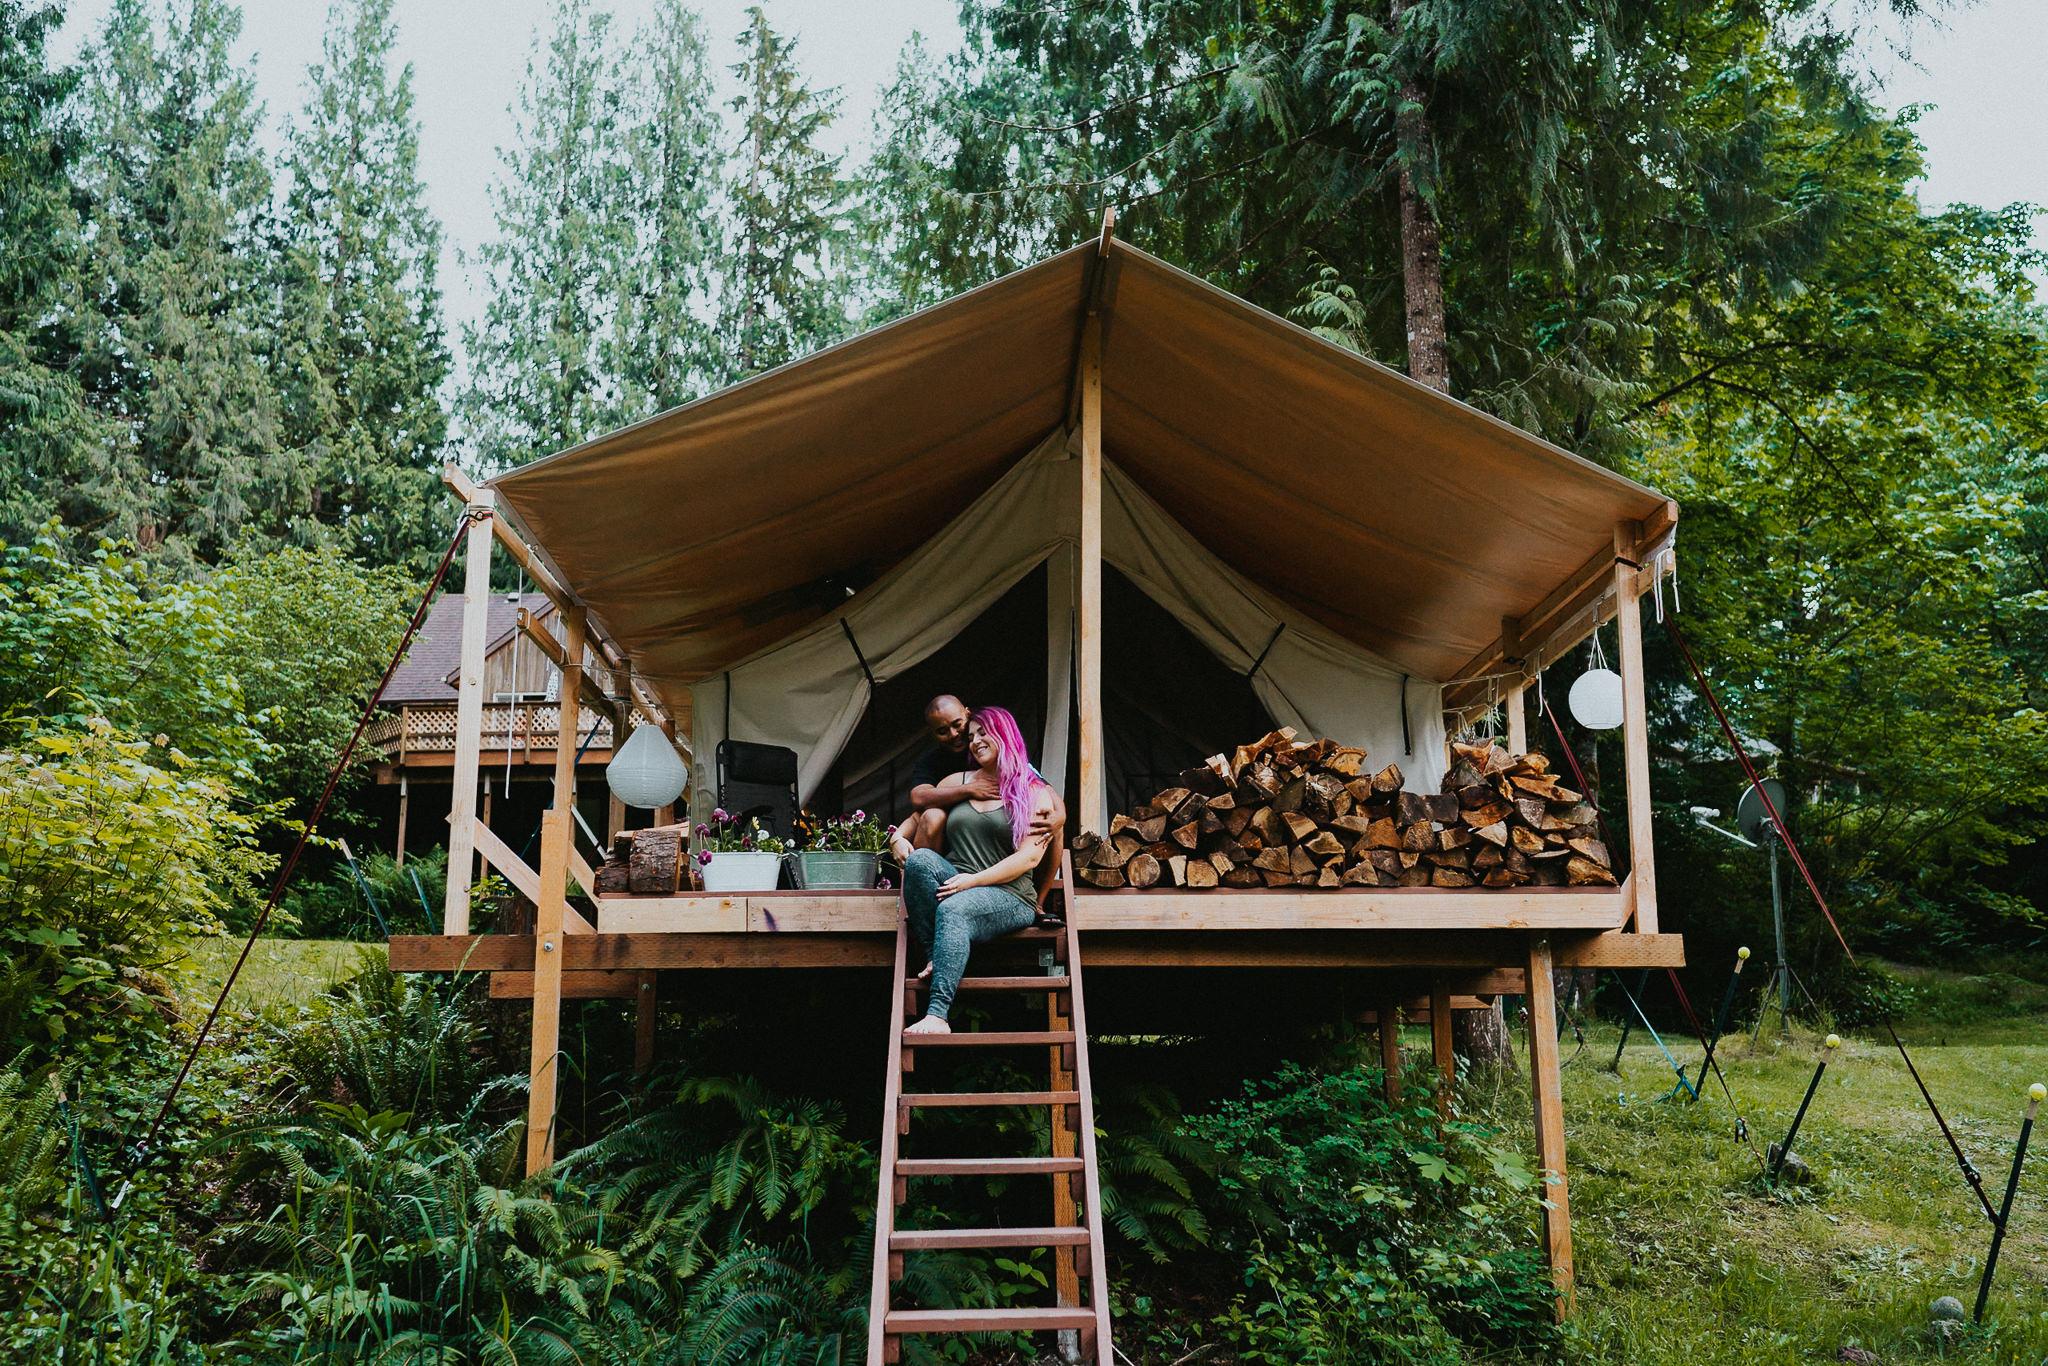 AirBNB-Mount-Hood-Sandy-Tent